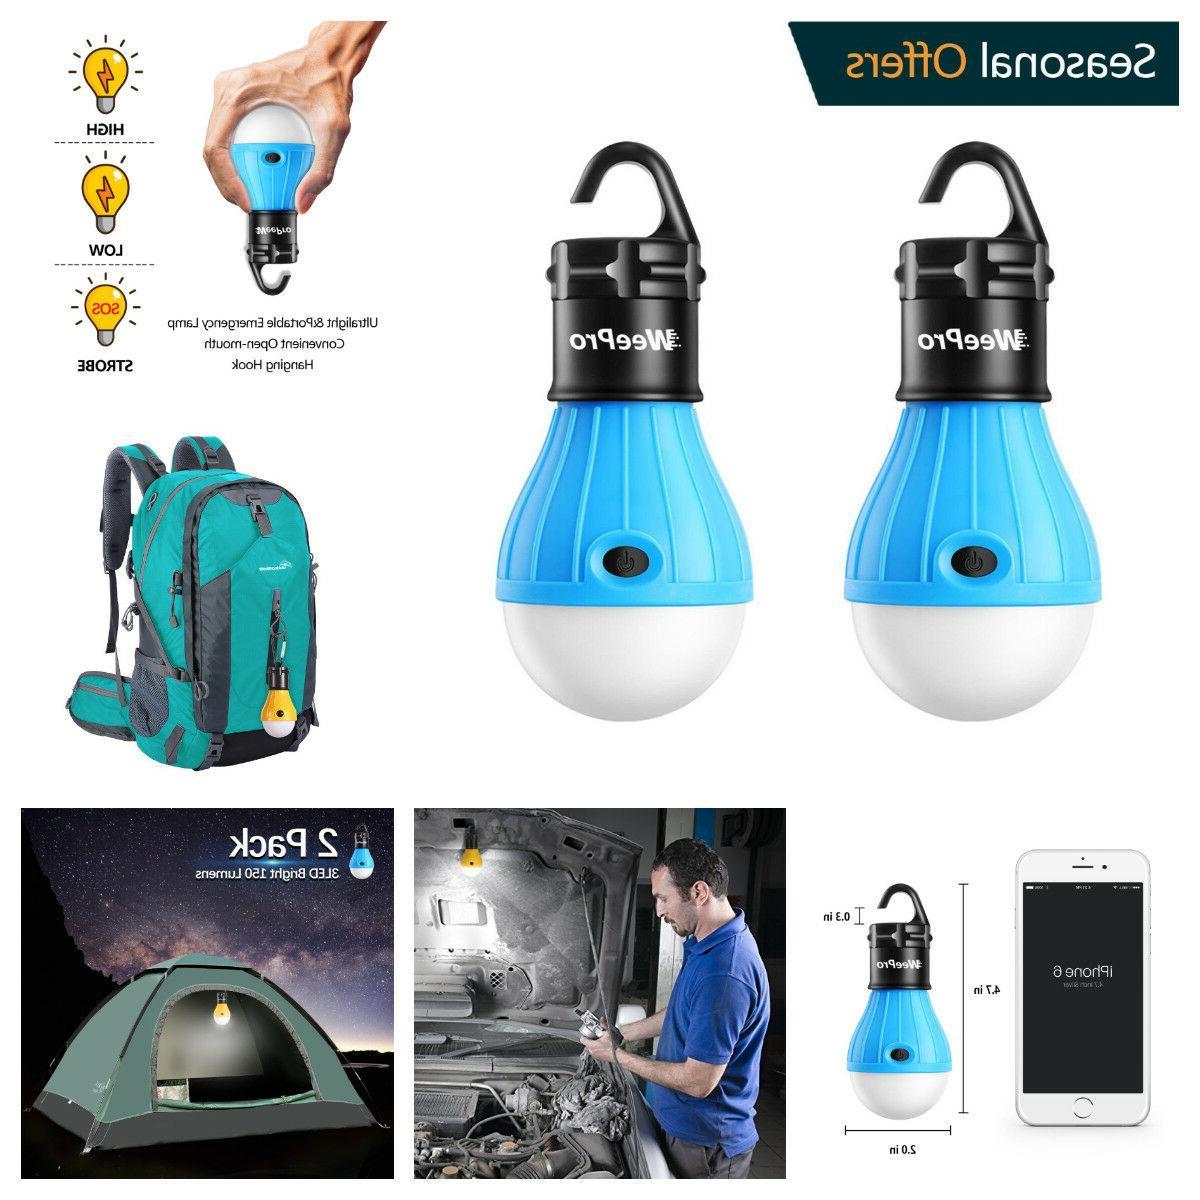 3 Tent Emergency Outdoor Light Lantern US